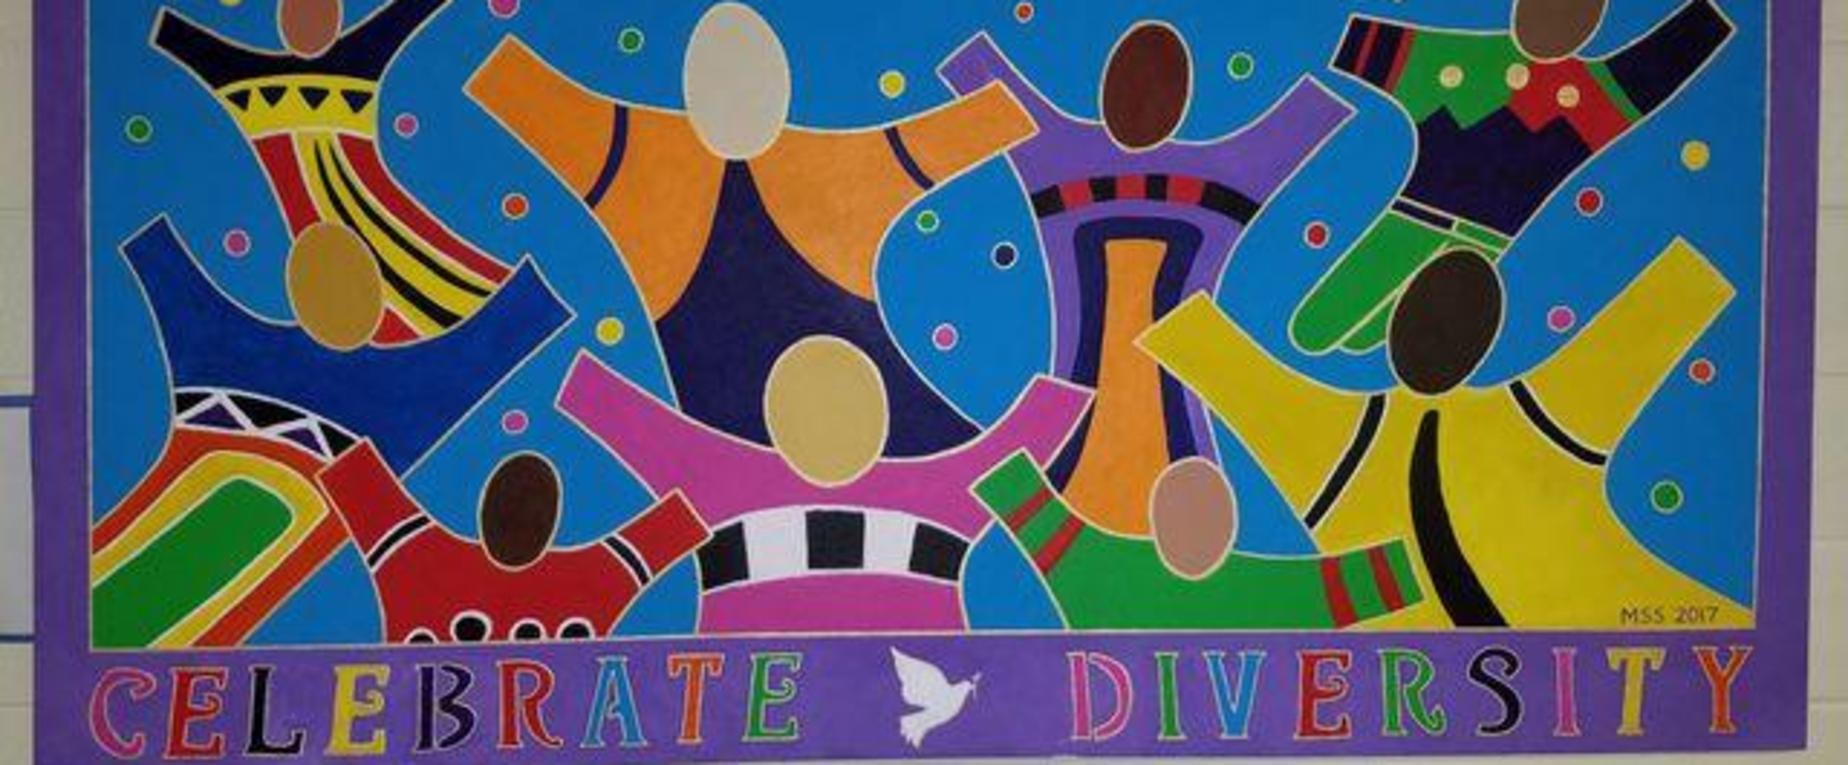 Celebrate Diversity Mural